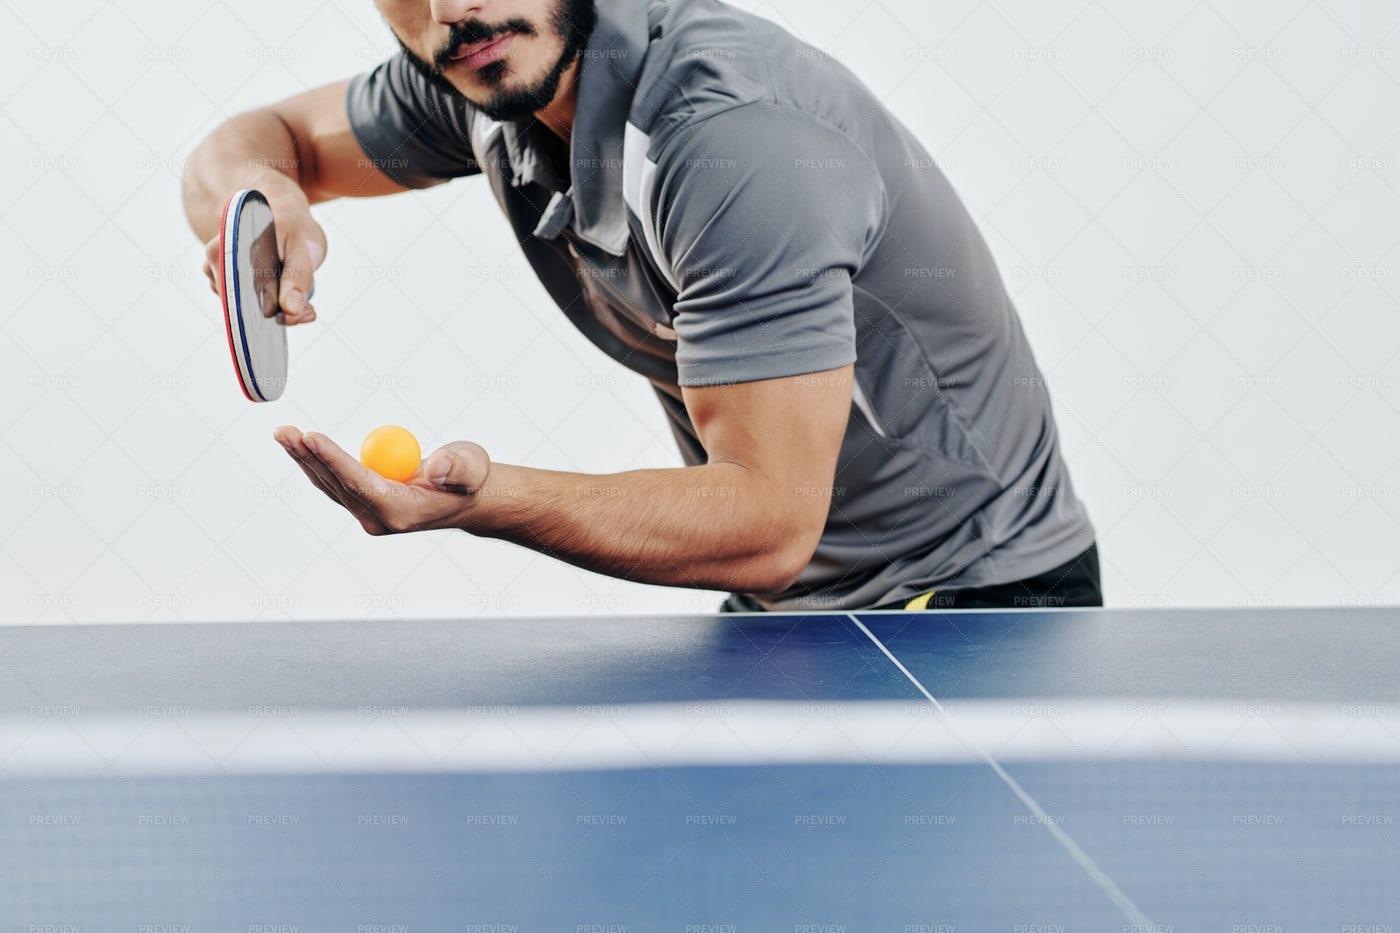 Ping Pong Player Serving Ball: Stock Photos